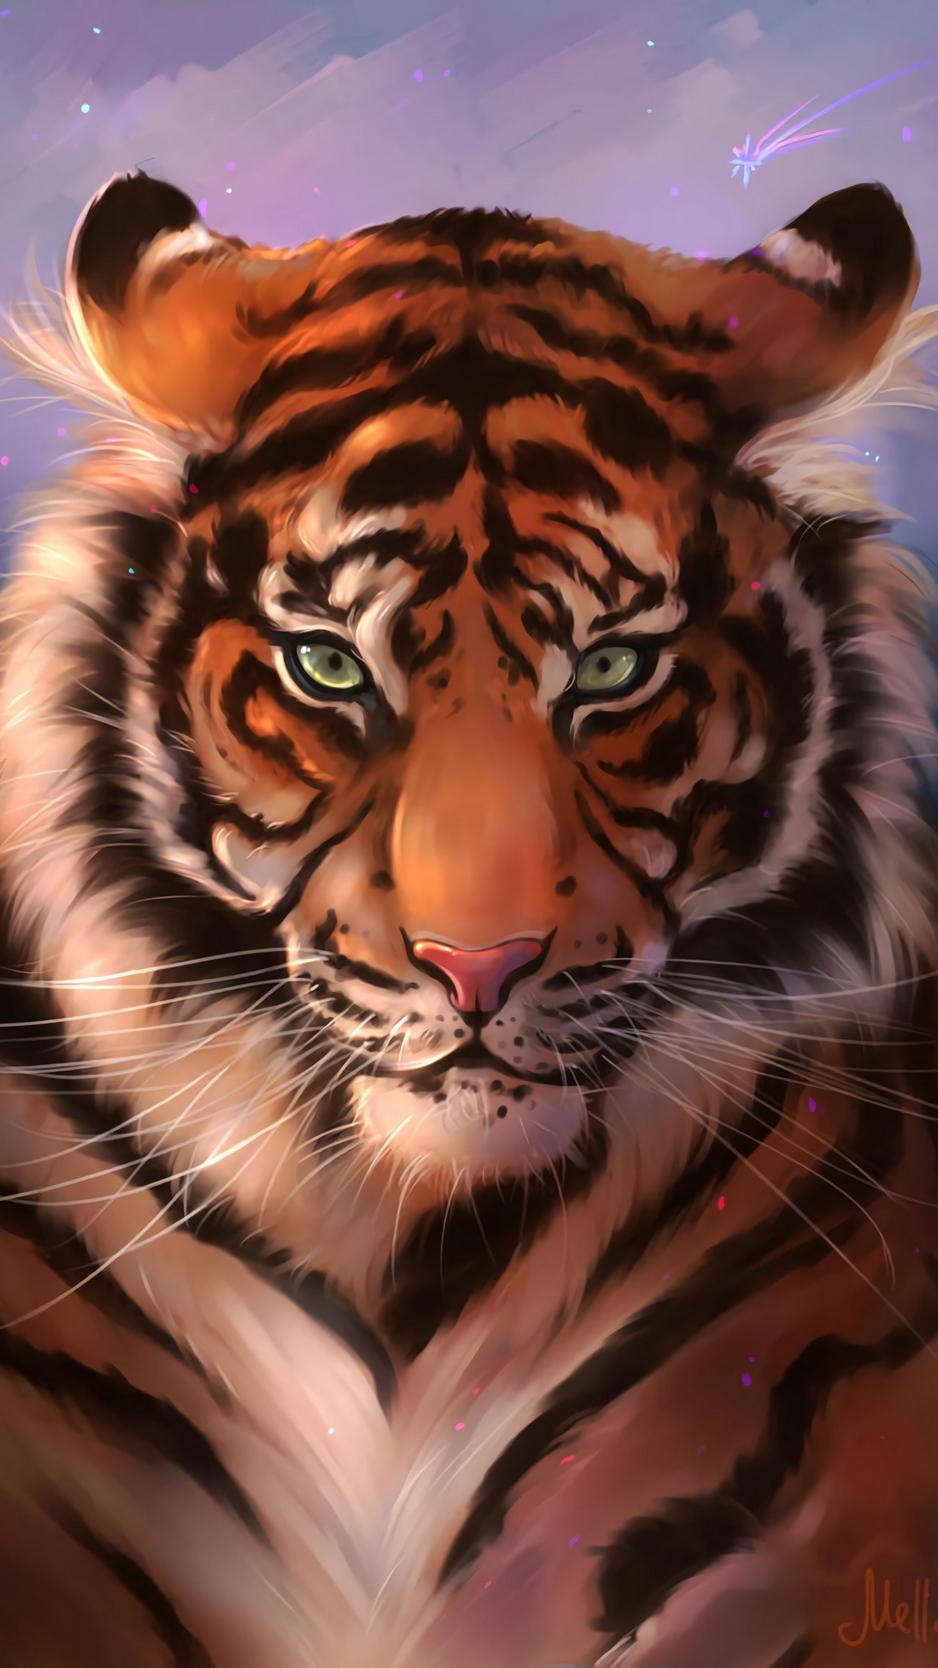 Wallpaper Tiger Muzzle Art Predator Striped Iphone 6 Tiger Art 2439114 Hd Wallpaper Backgrounds Download